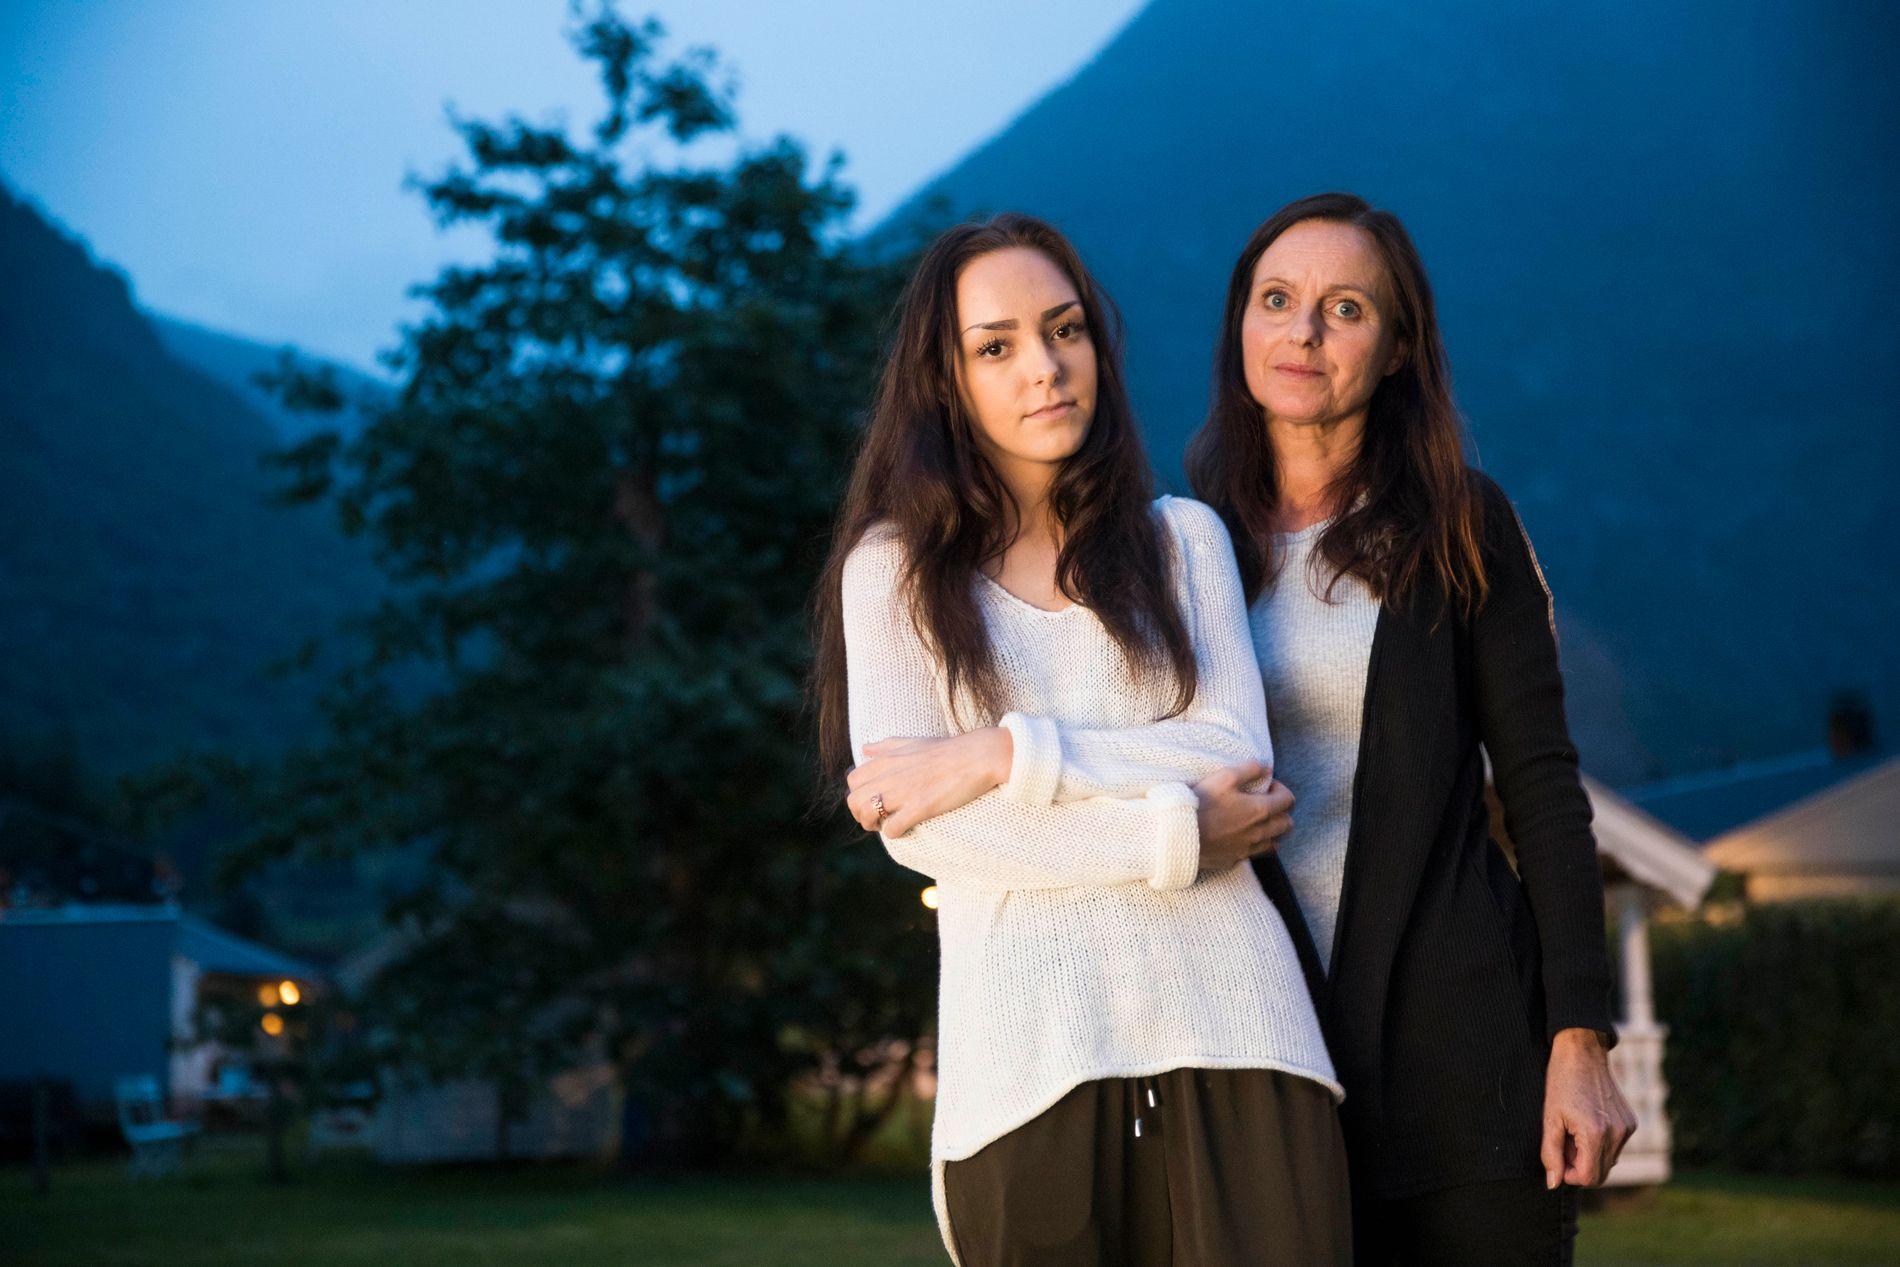 STÅR SAMMEN: Andrea Voll Voldum og hennes mor Wenche Voll hjemme i Lærdal.